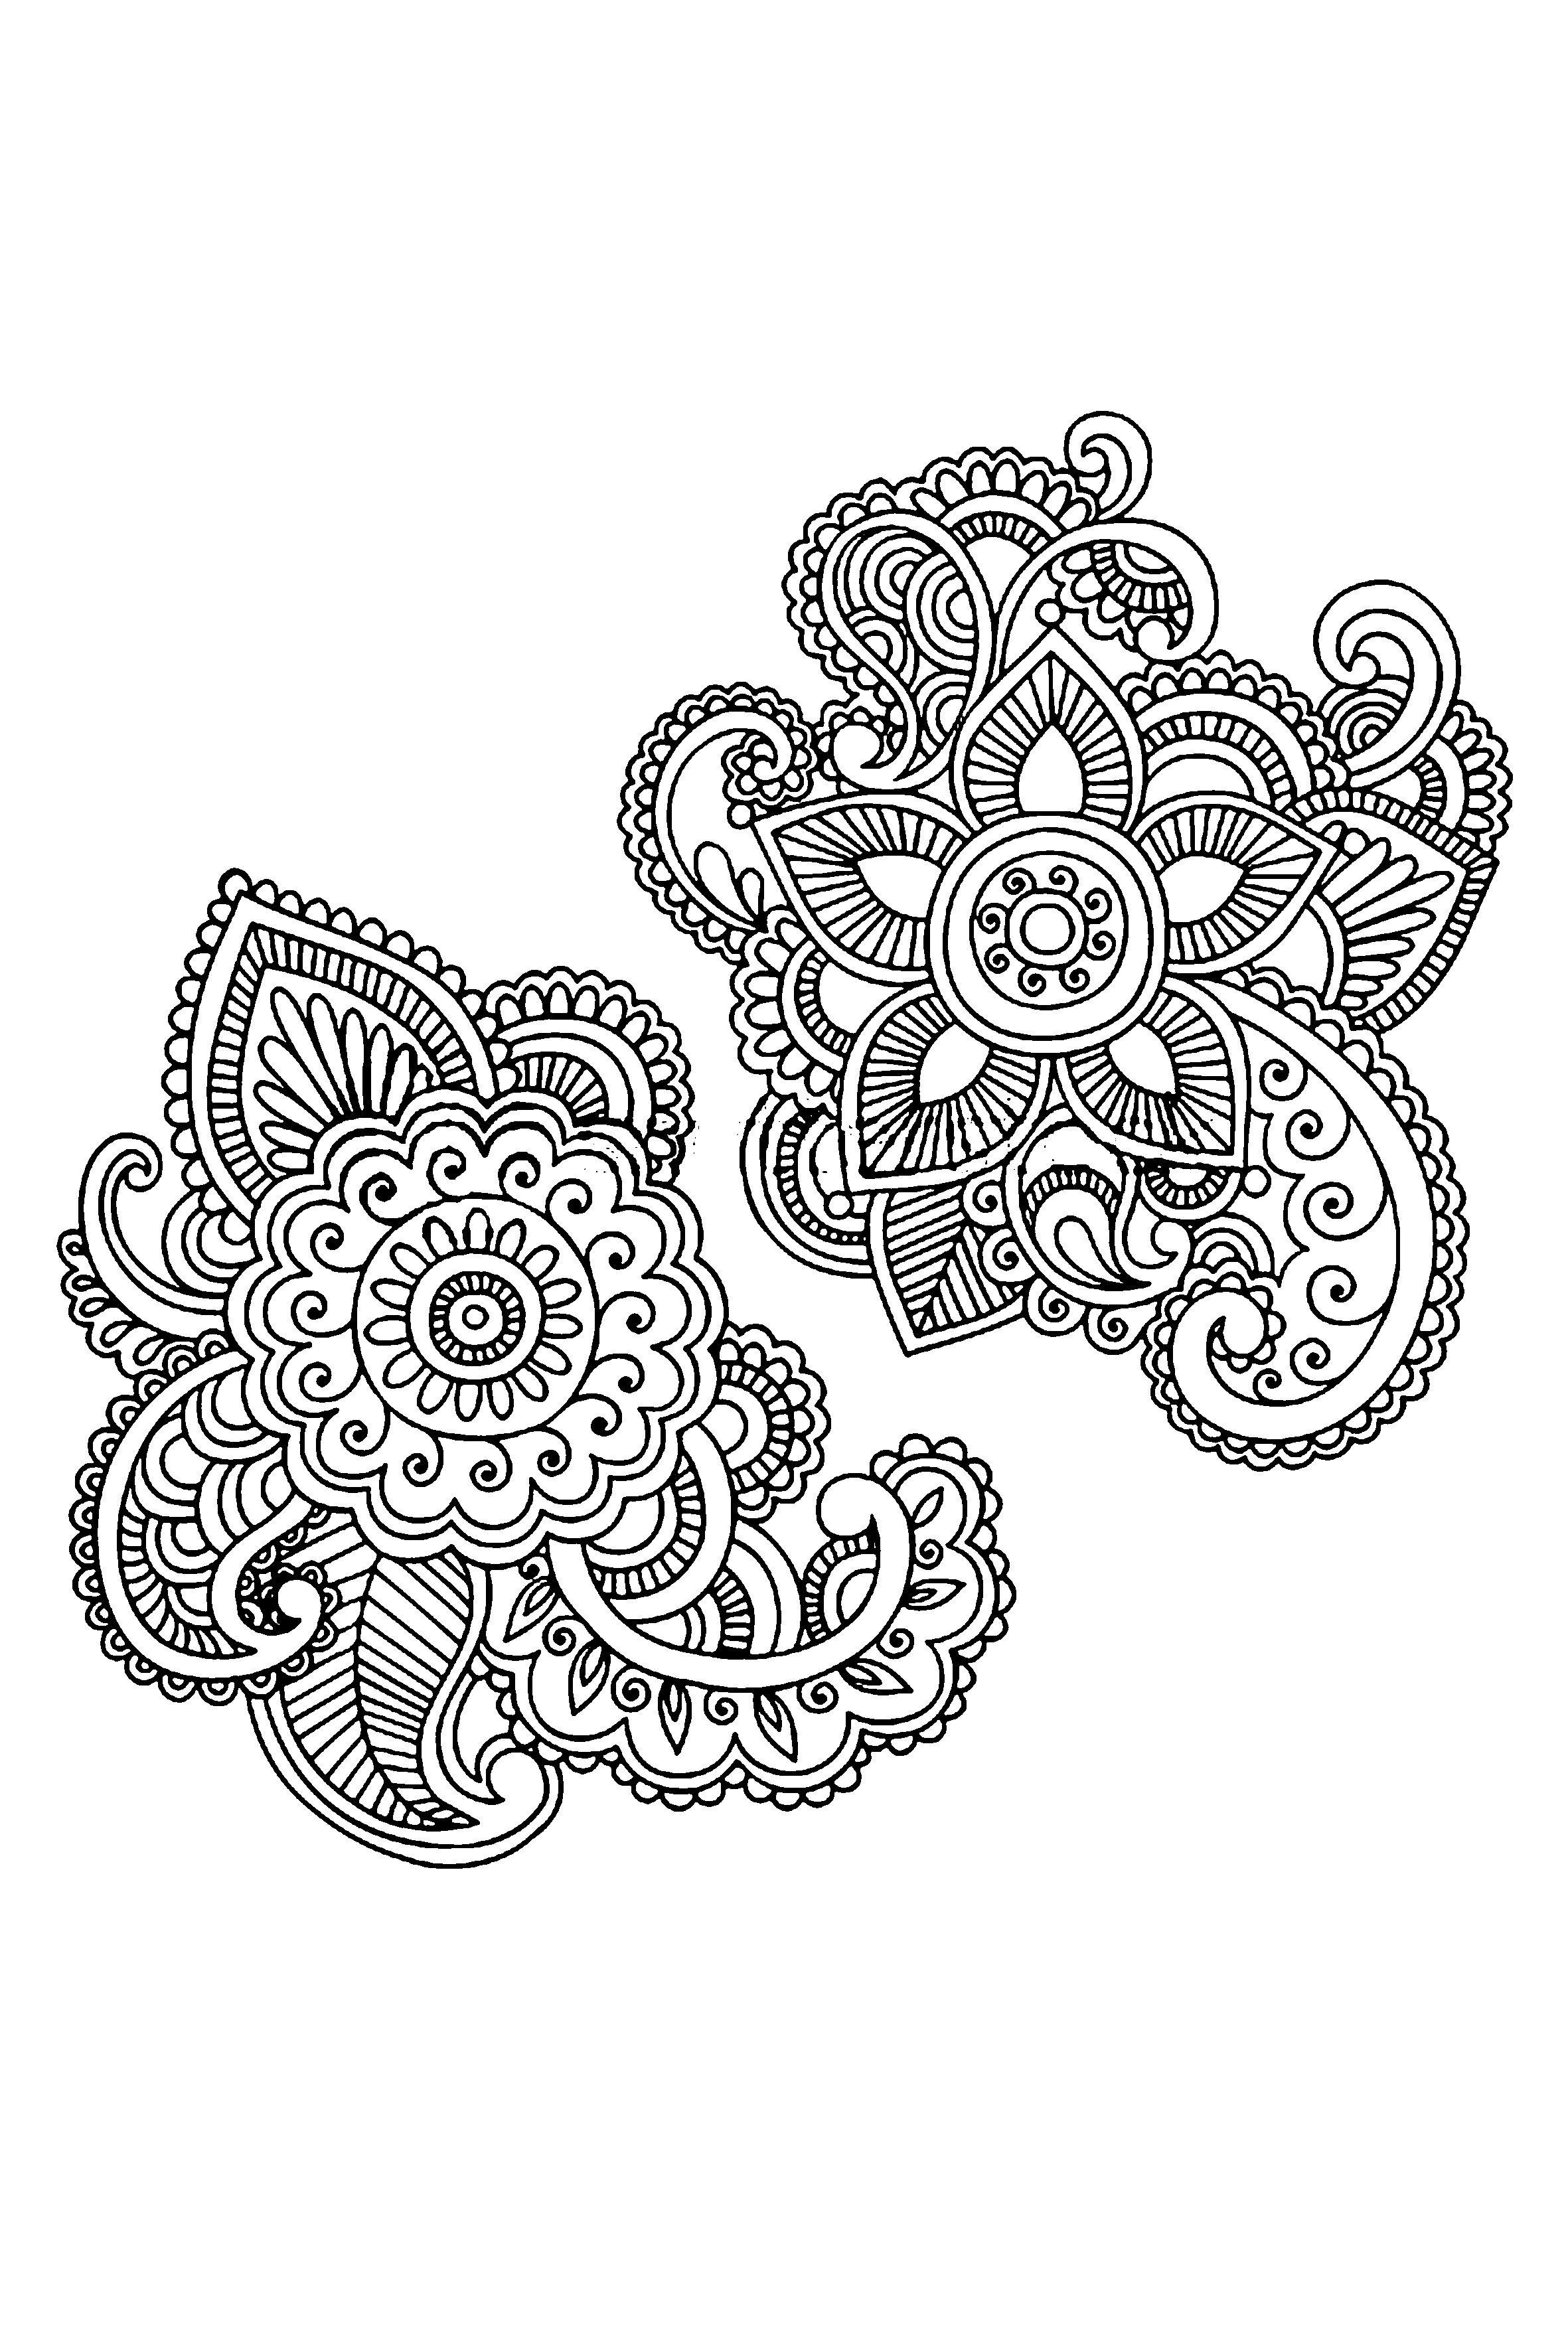 ee3f6dbcac723 Henna Flowers | Hand Drawn Abstract Henna Mehndi Paisley Doodle Vector  Illustration .